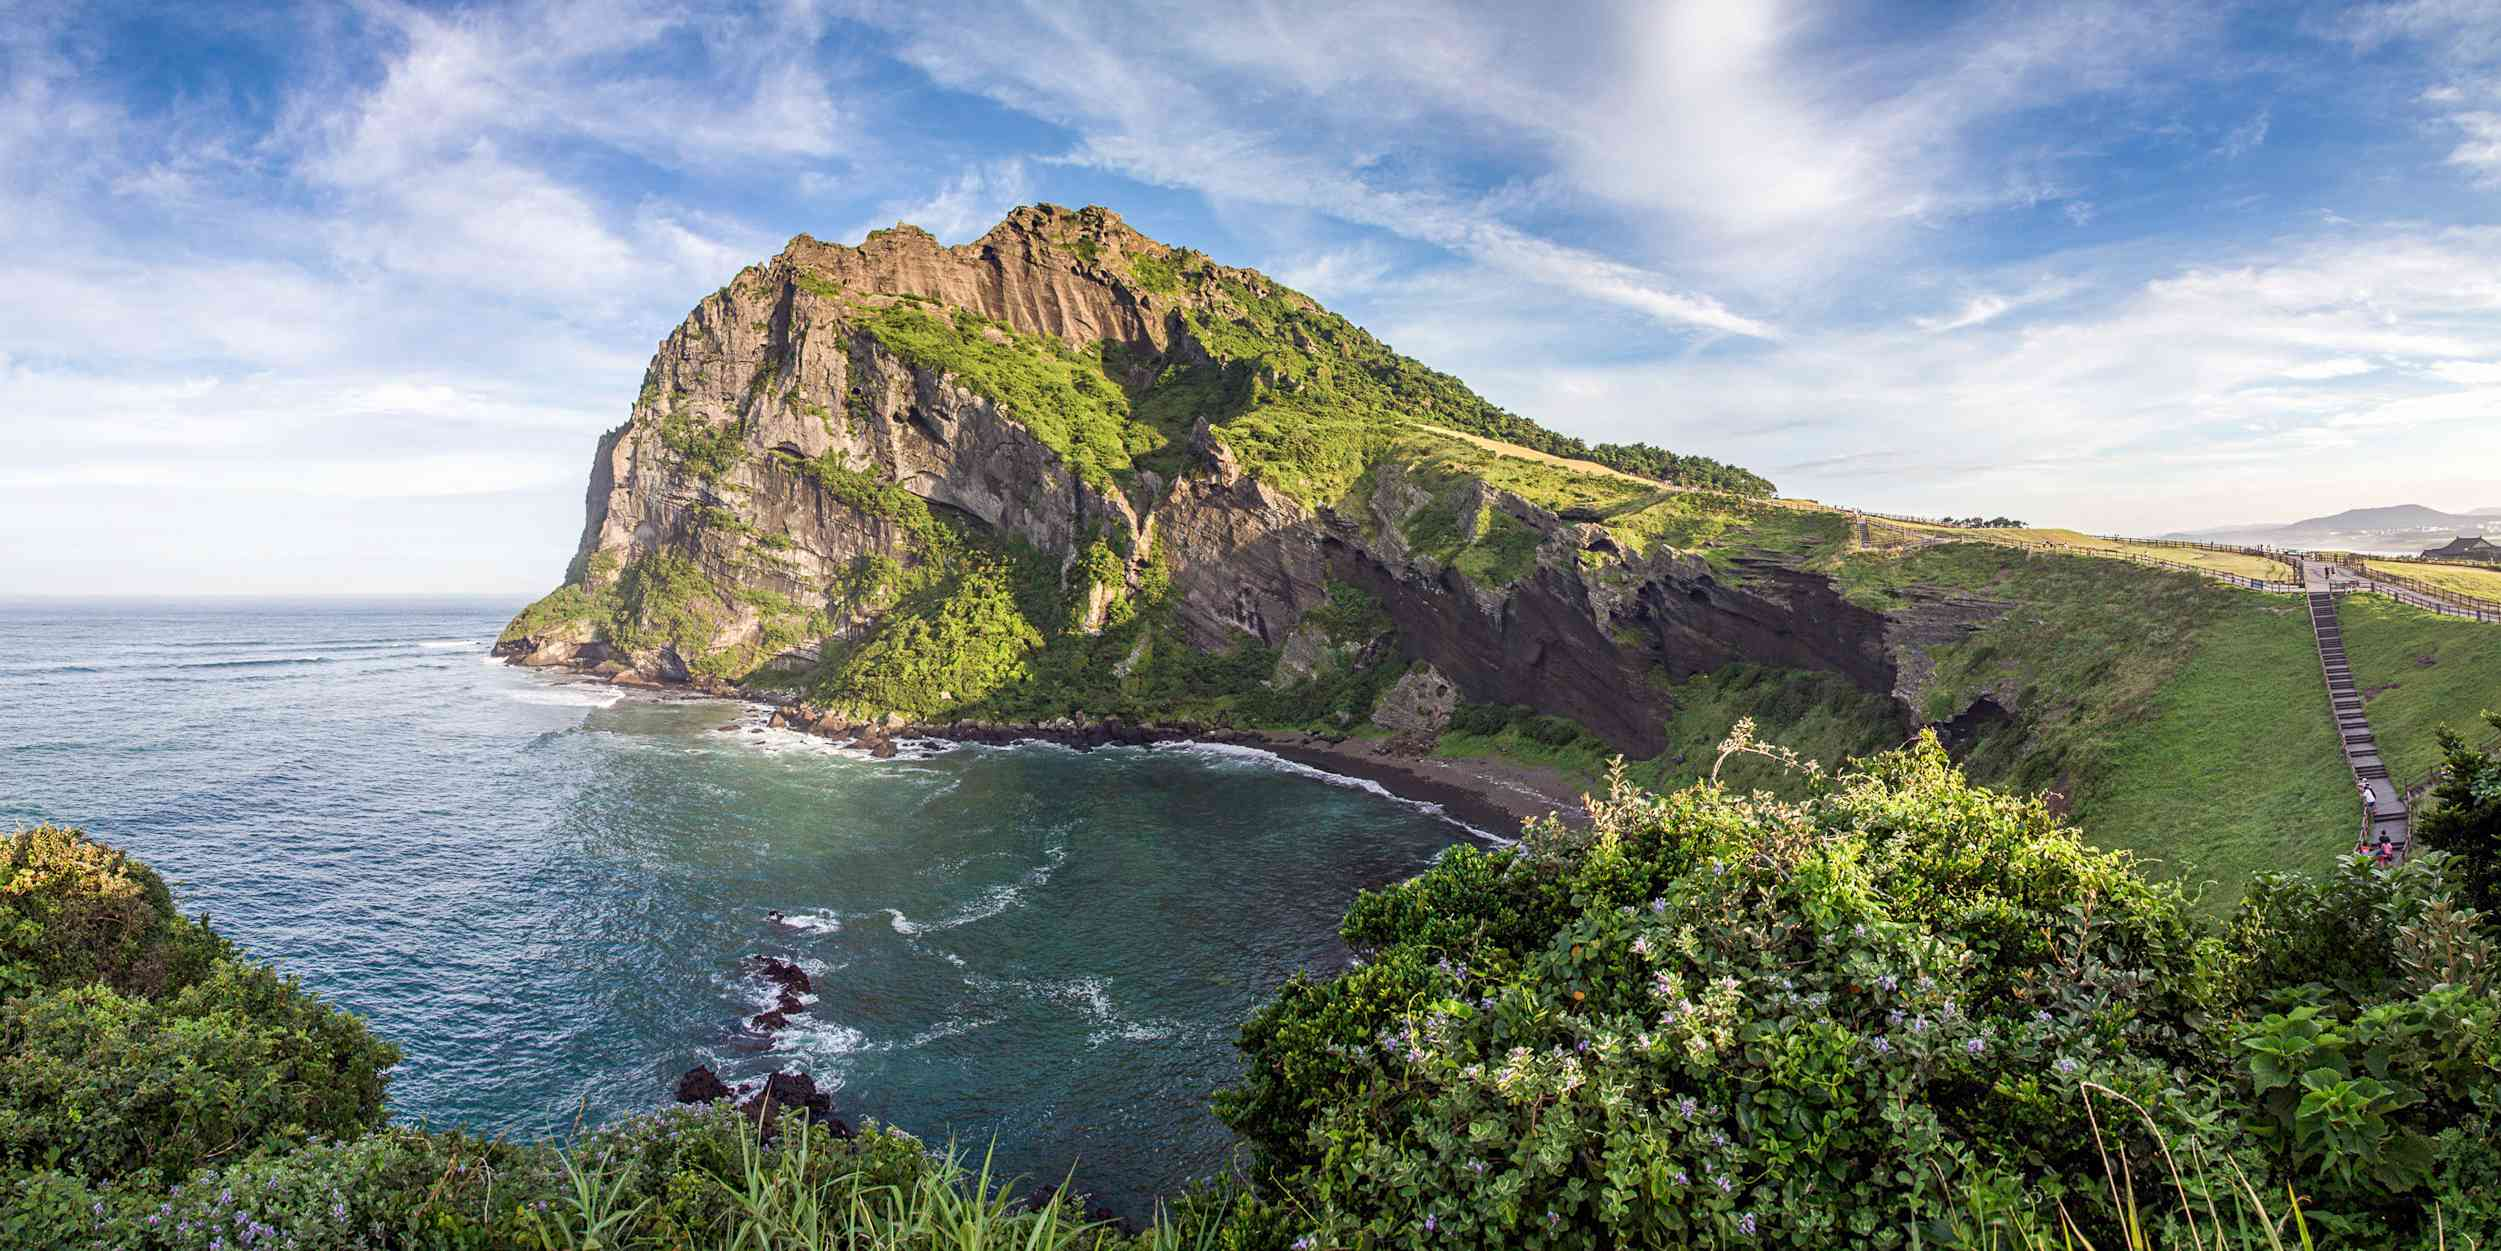 Coastal landscape of Jeju Island, South Korea